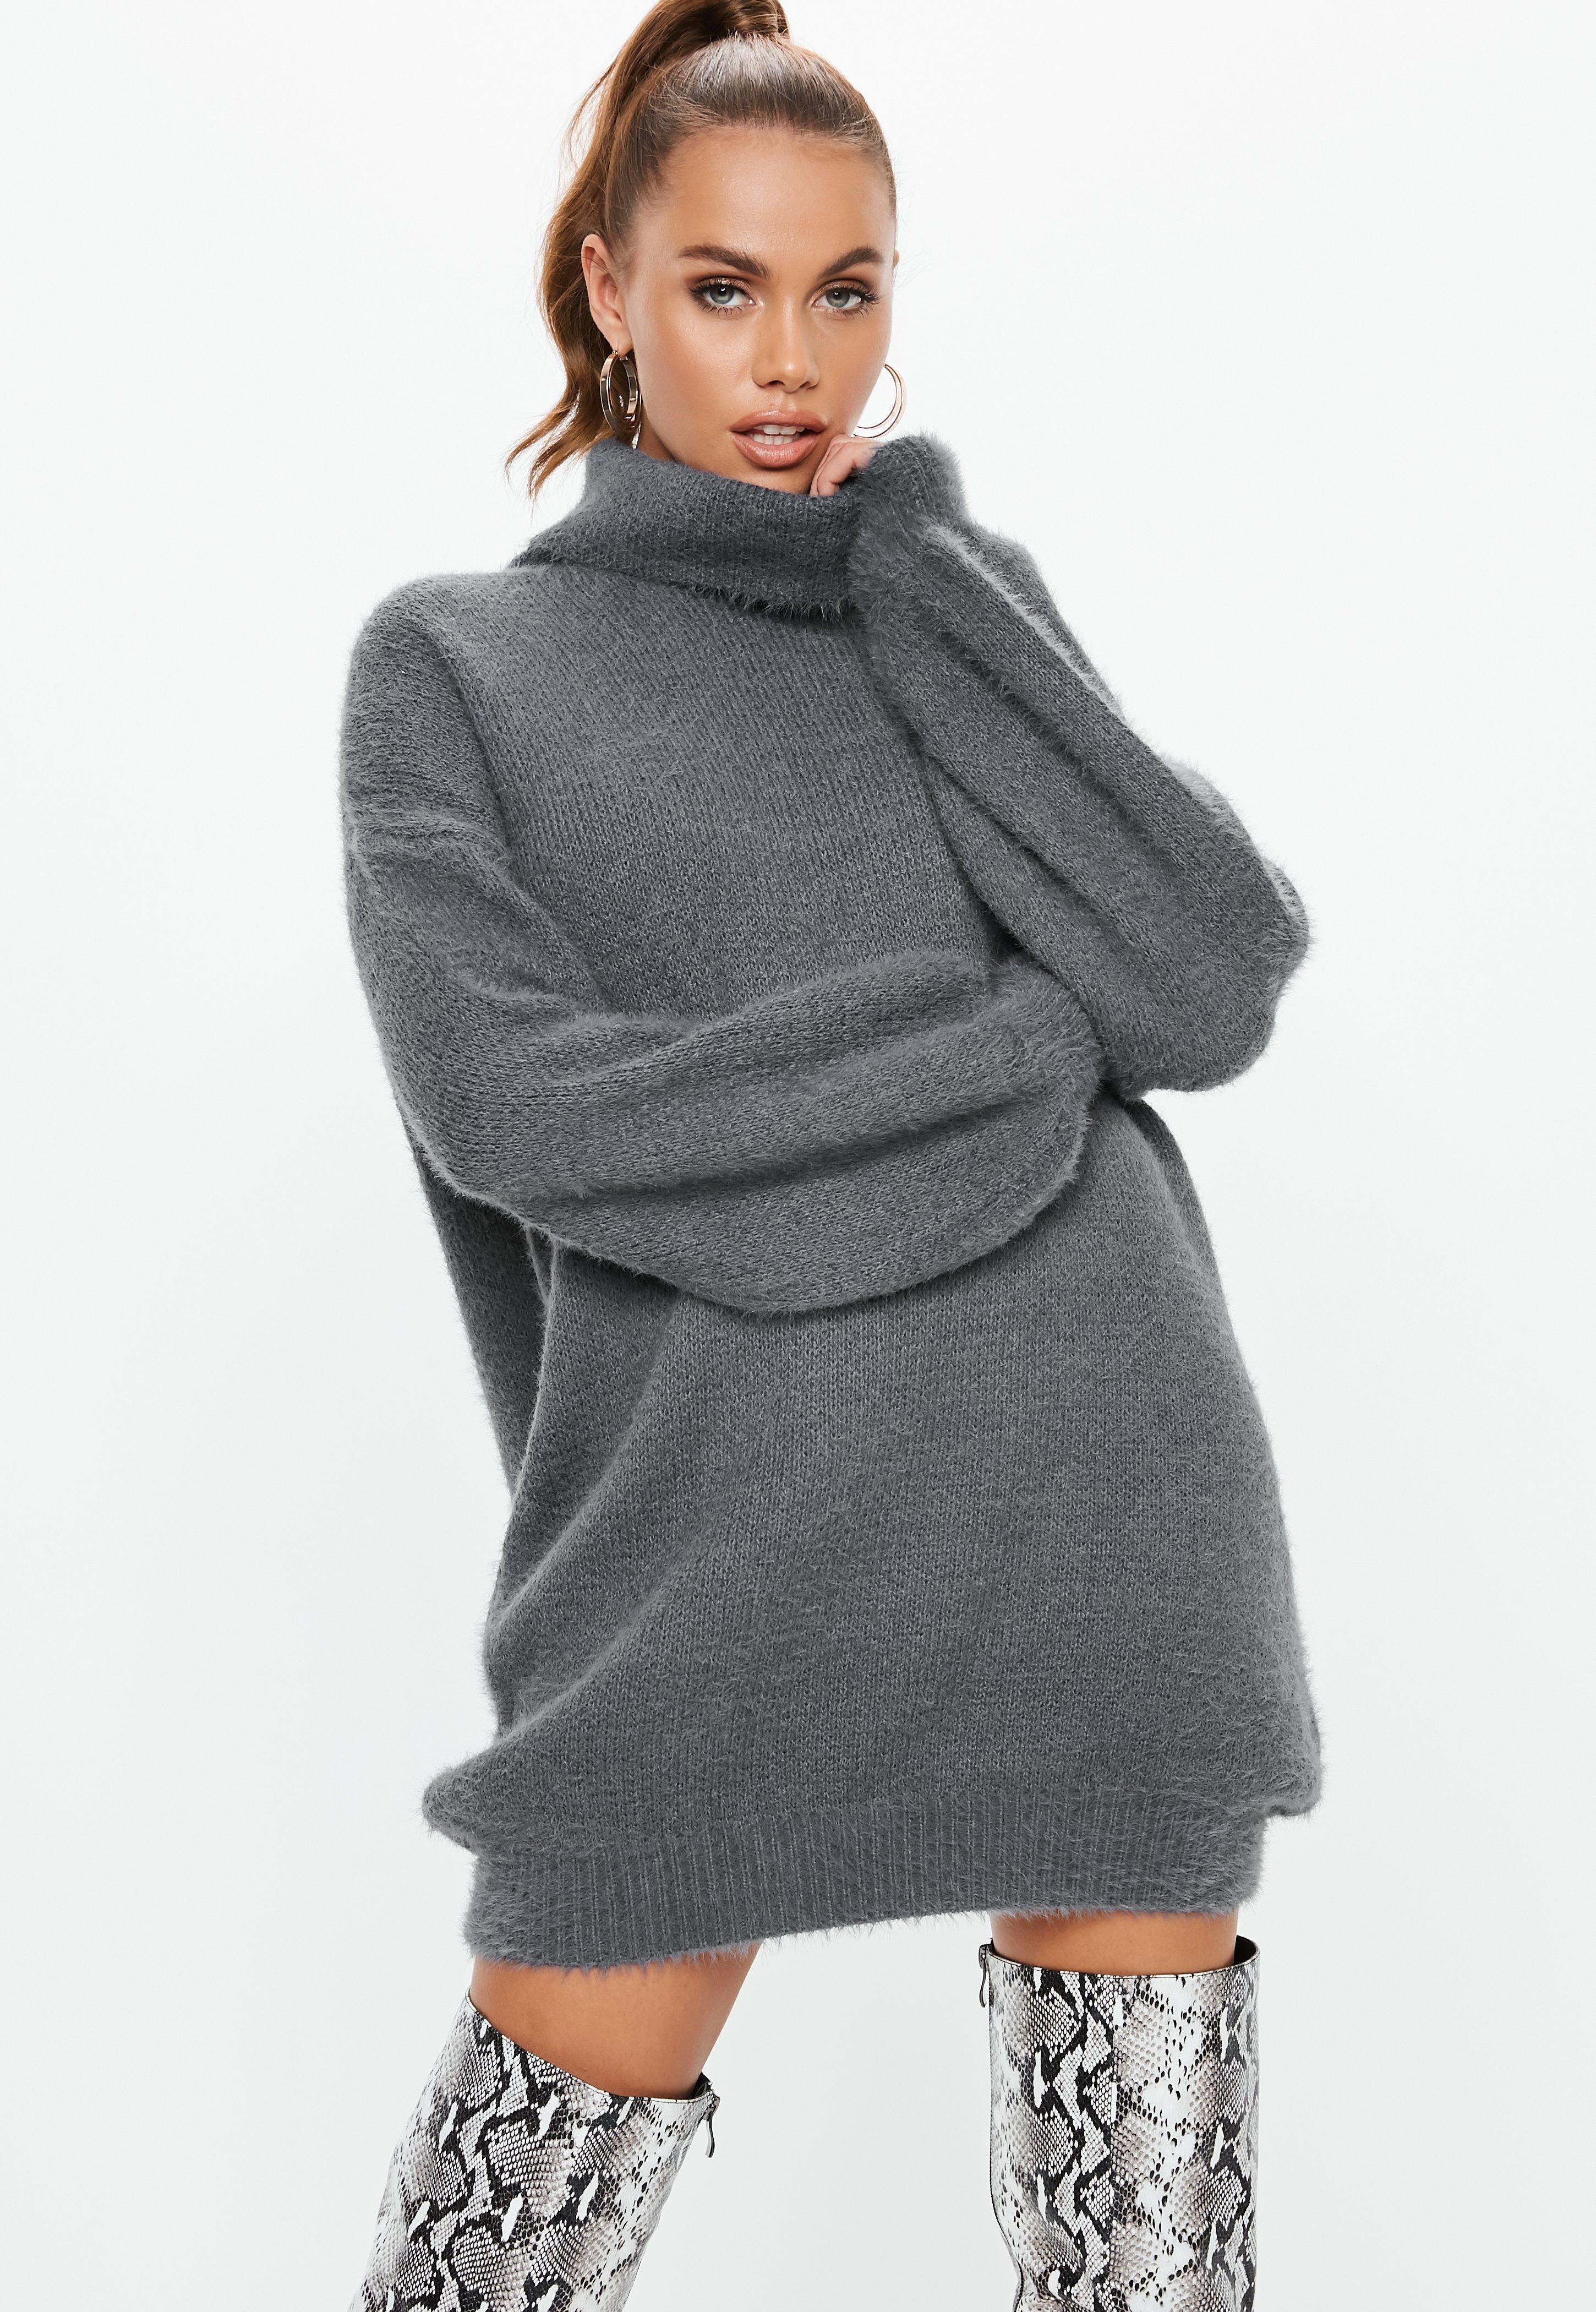 ace16374938 Premium Grey Fluffy Roll Neck Jumper Dress